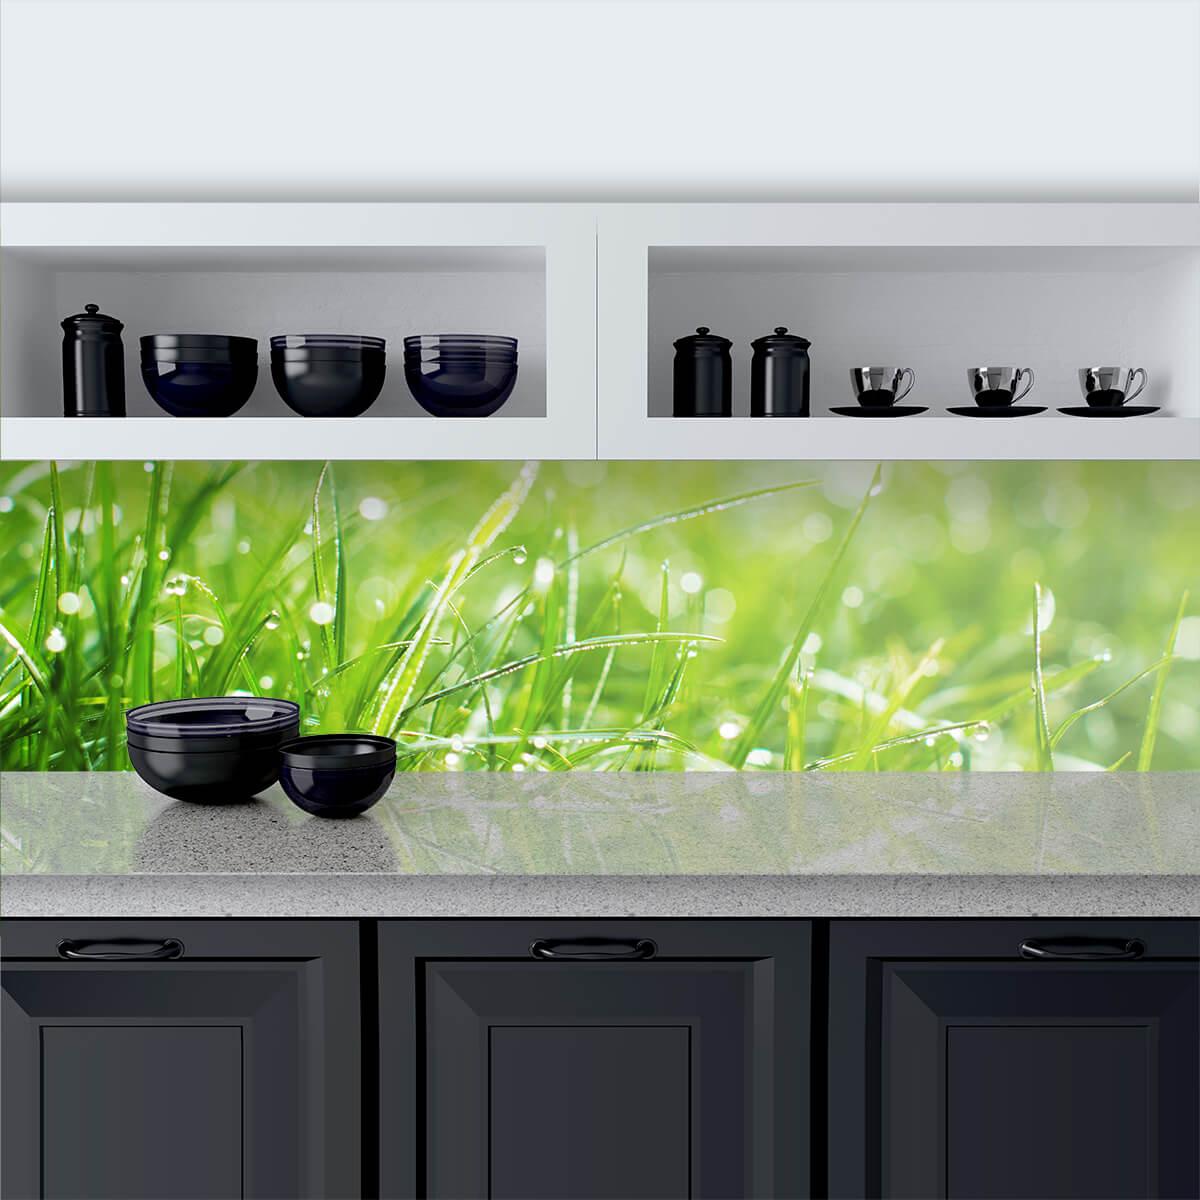 bilder k chenr ckwand k chenr ckwand nach ma. Black Bedroom Furniture Sets. Home Design Ideas